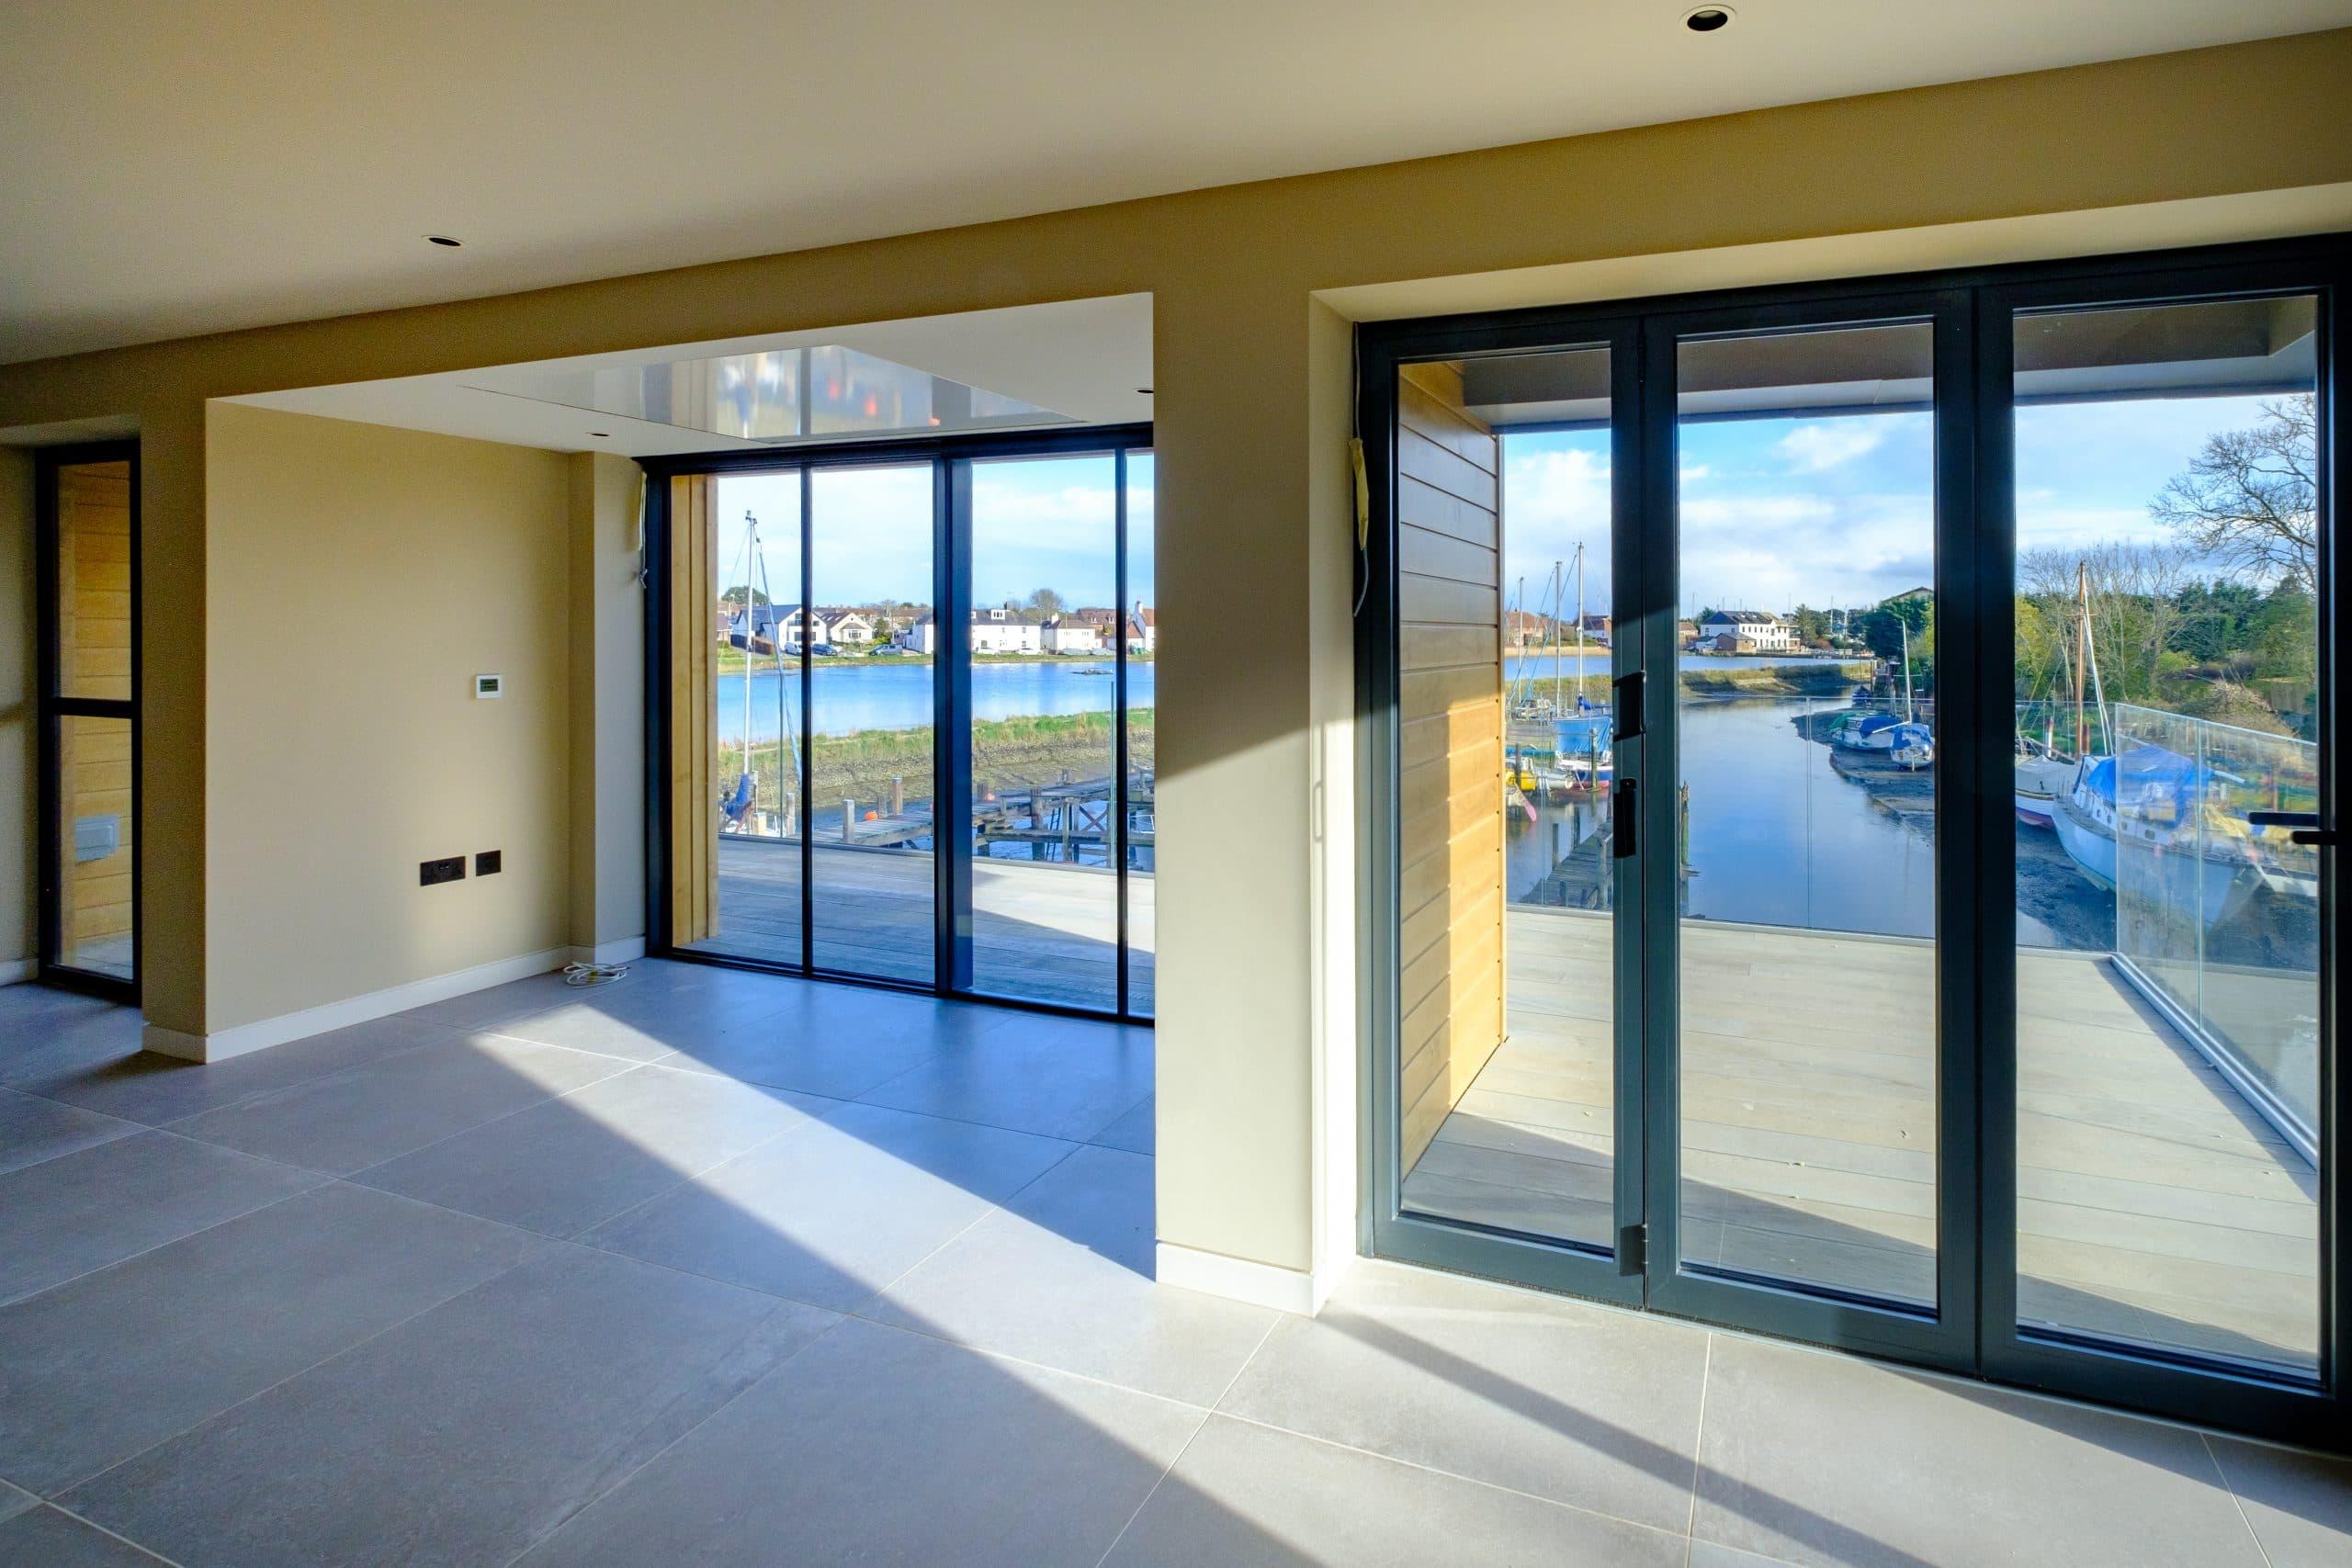 aluminium bifold door and aluminium sliding door in a luxury residential development by the coast